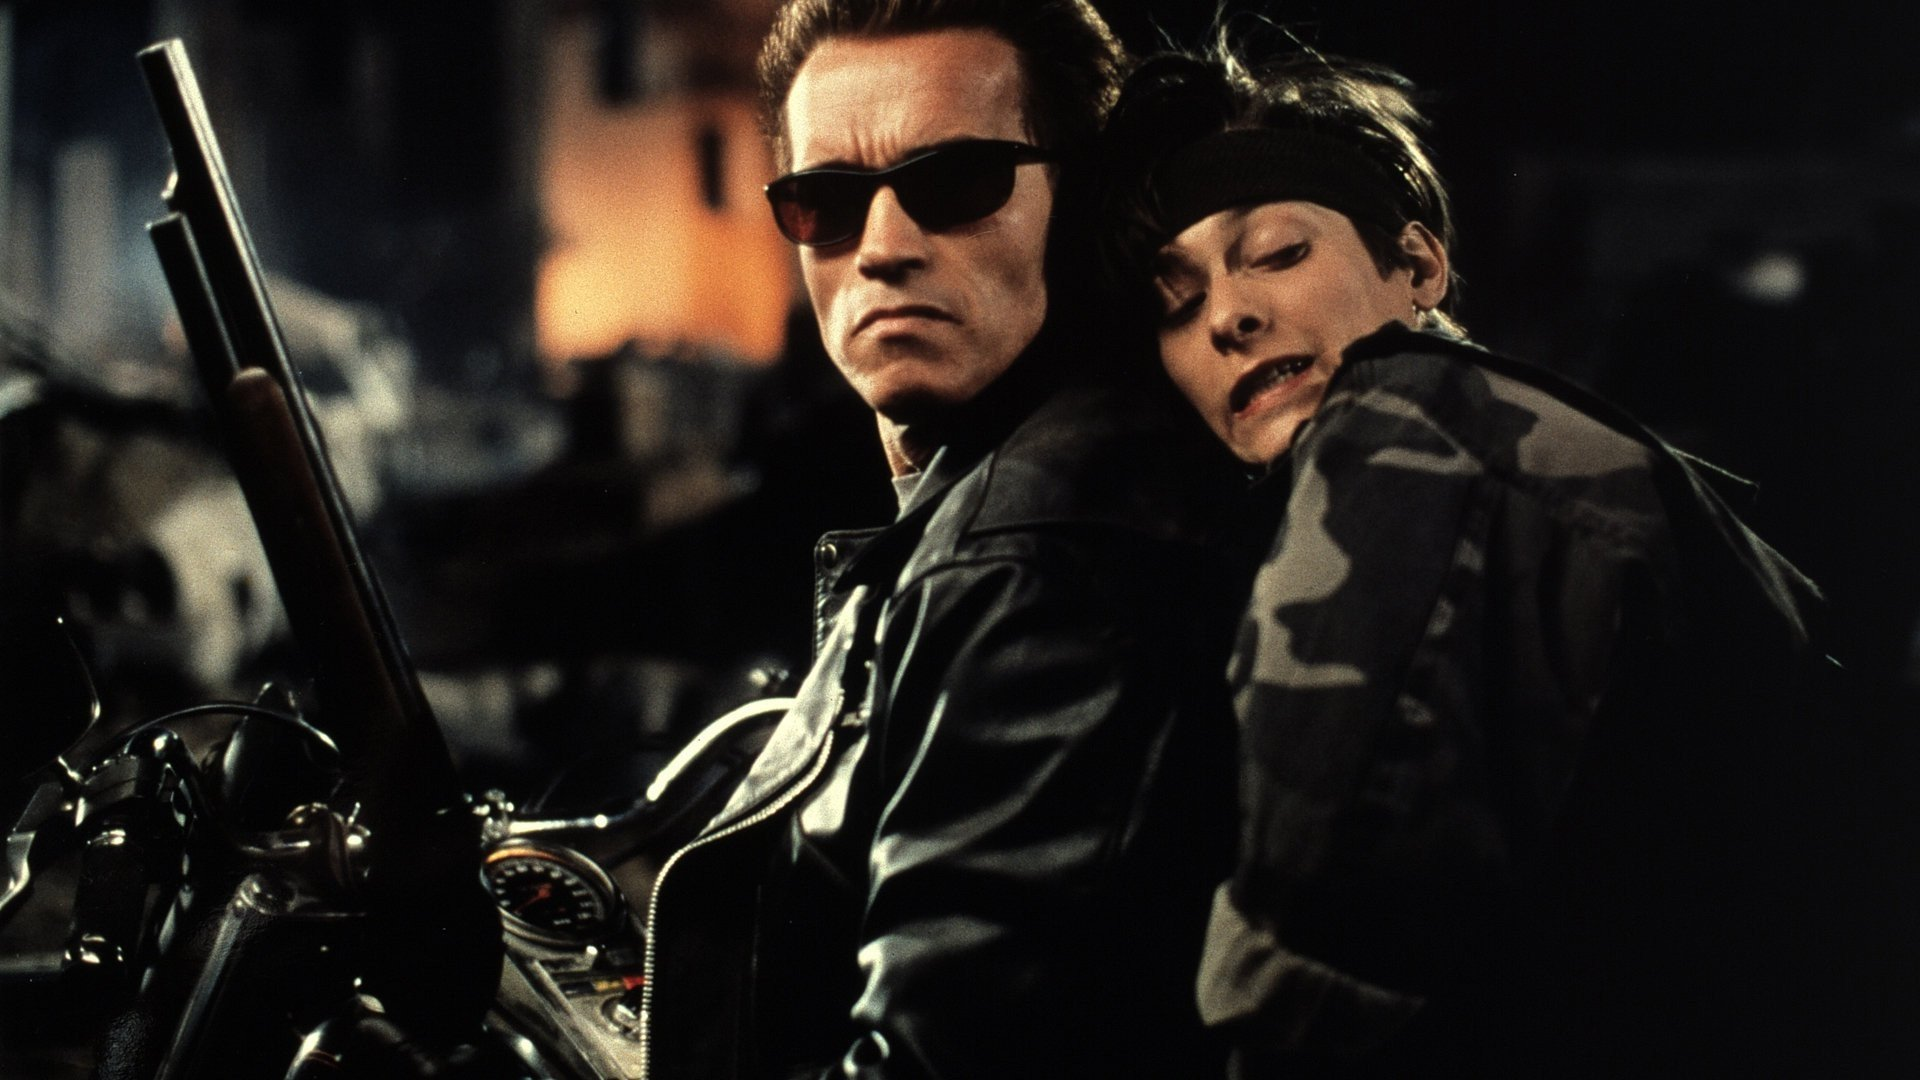 Terminator 2 judgment day hd wallpaper background image 1920x1080 id 679106 wallpaper abyss - Terminator 2 wallpaper hd ...